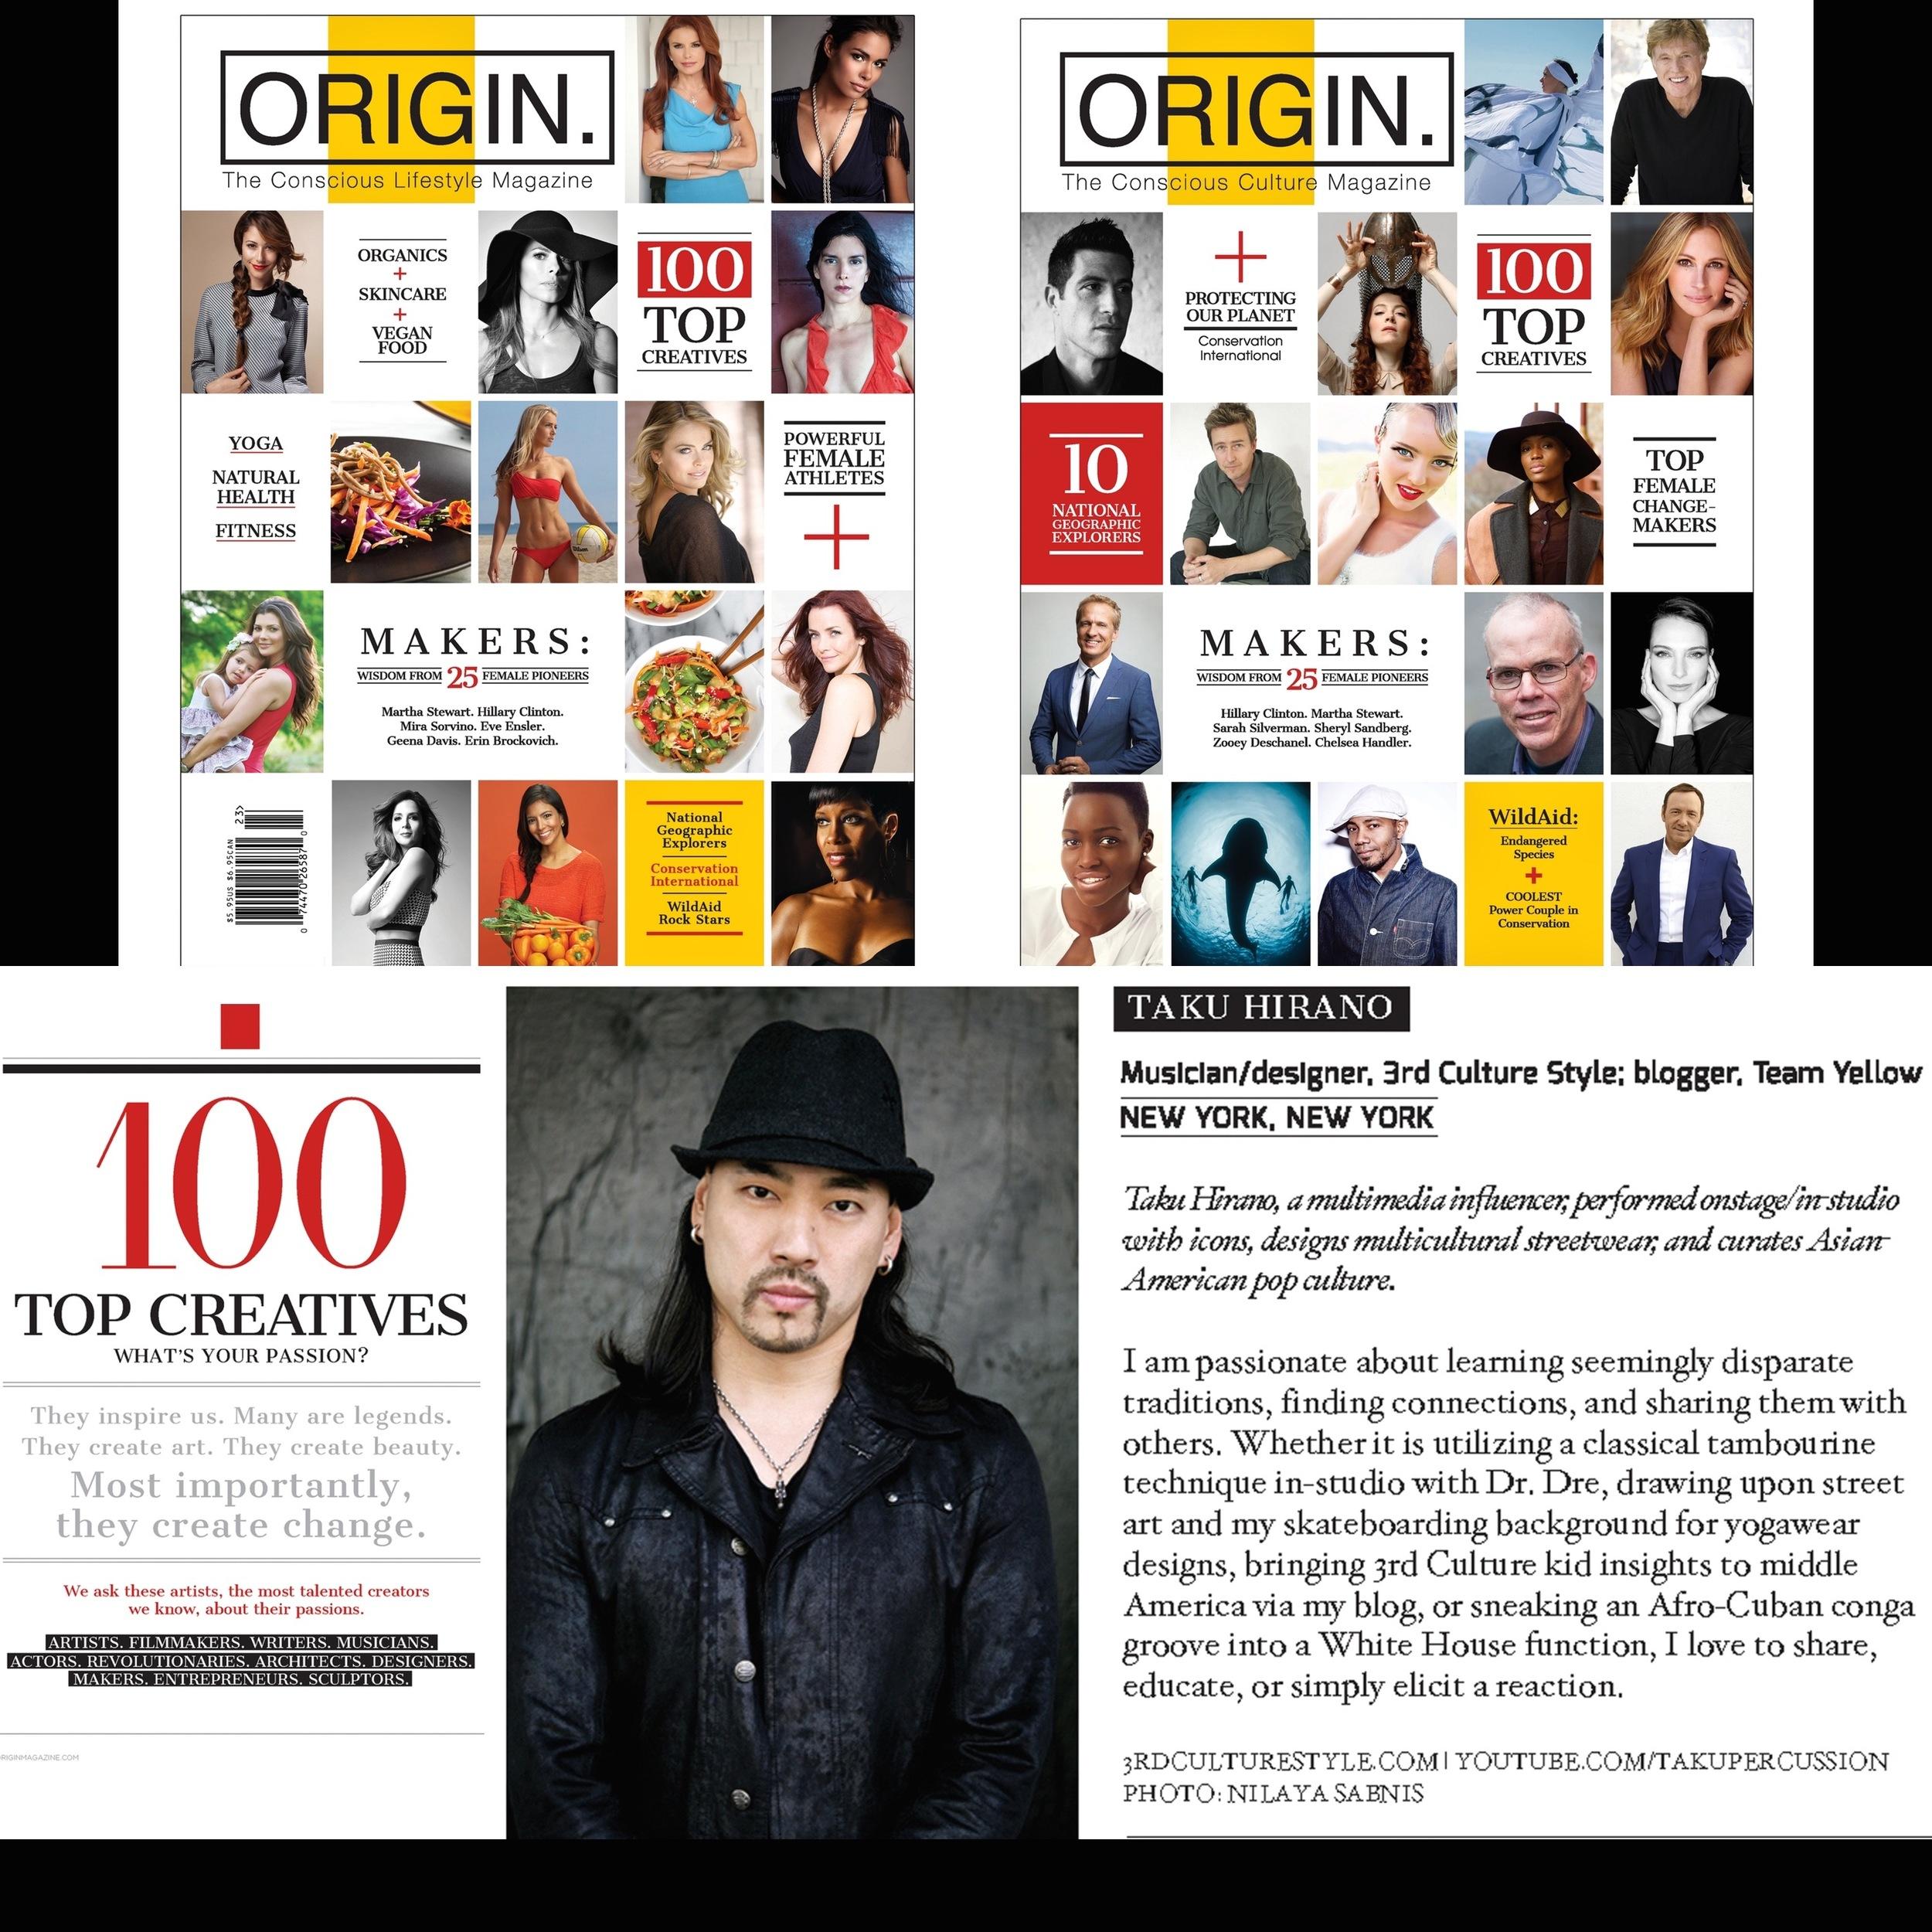 ORIGIN Magazine: Top 100 Creatives